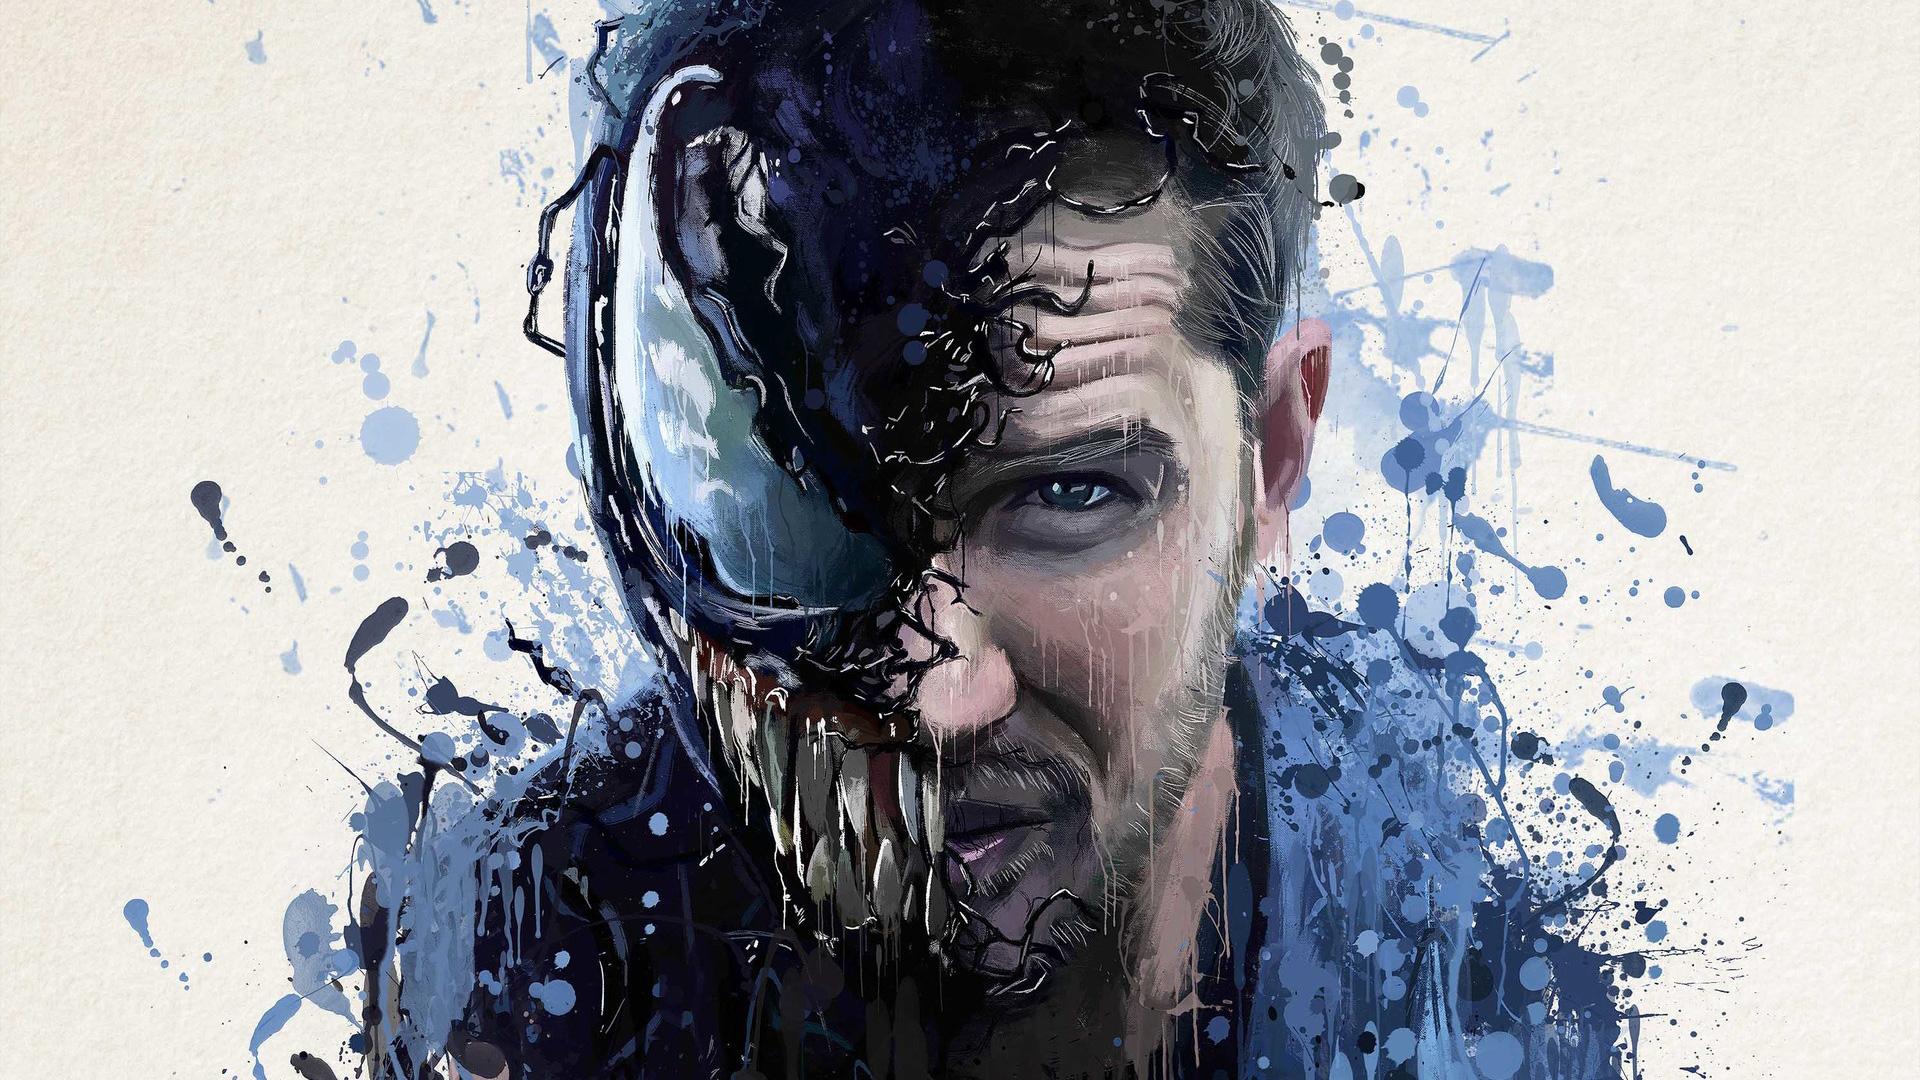 Venom Movie Splash Art Hd Superheroes 4k Wallpapers Images